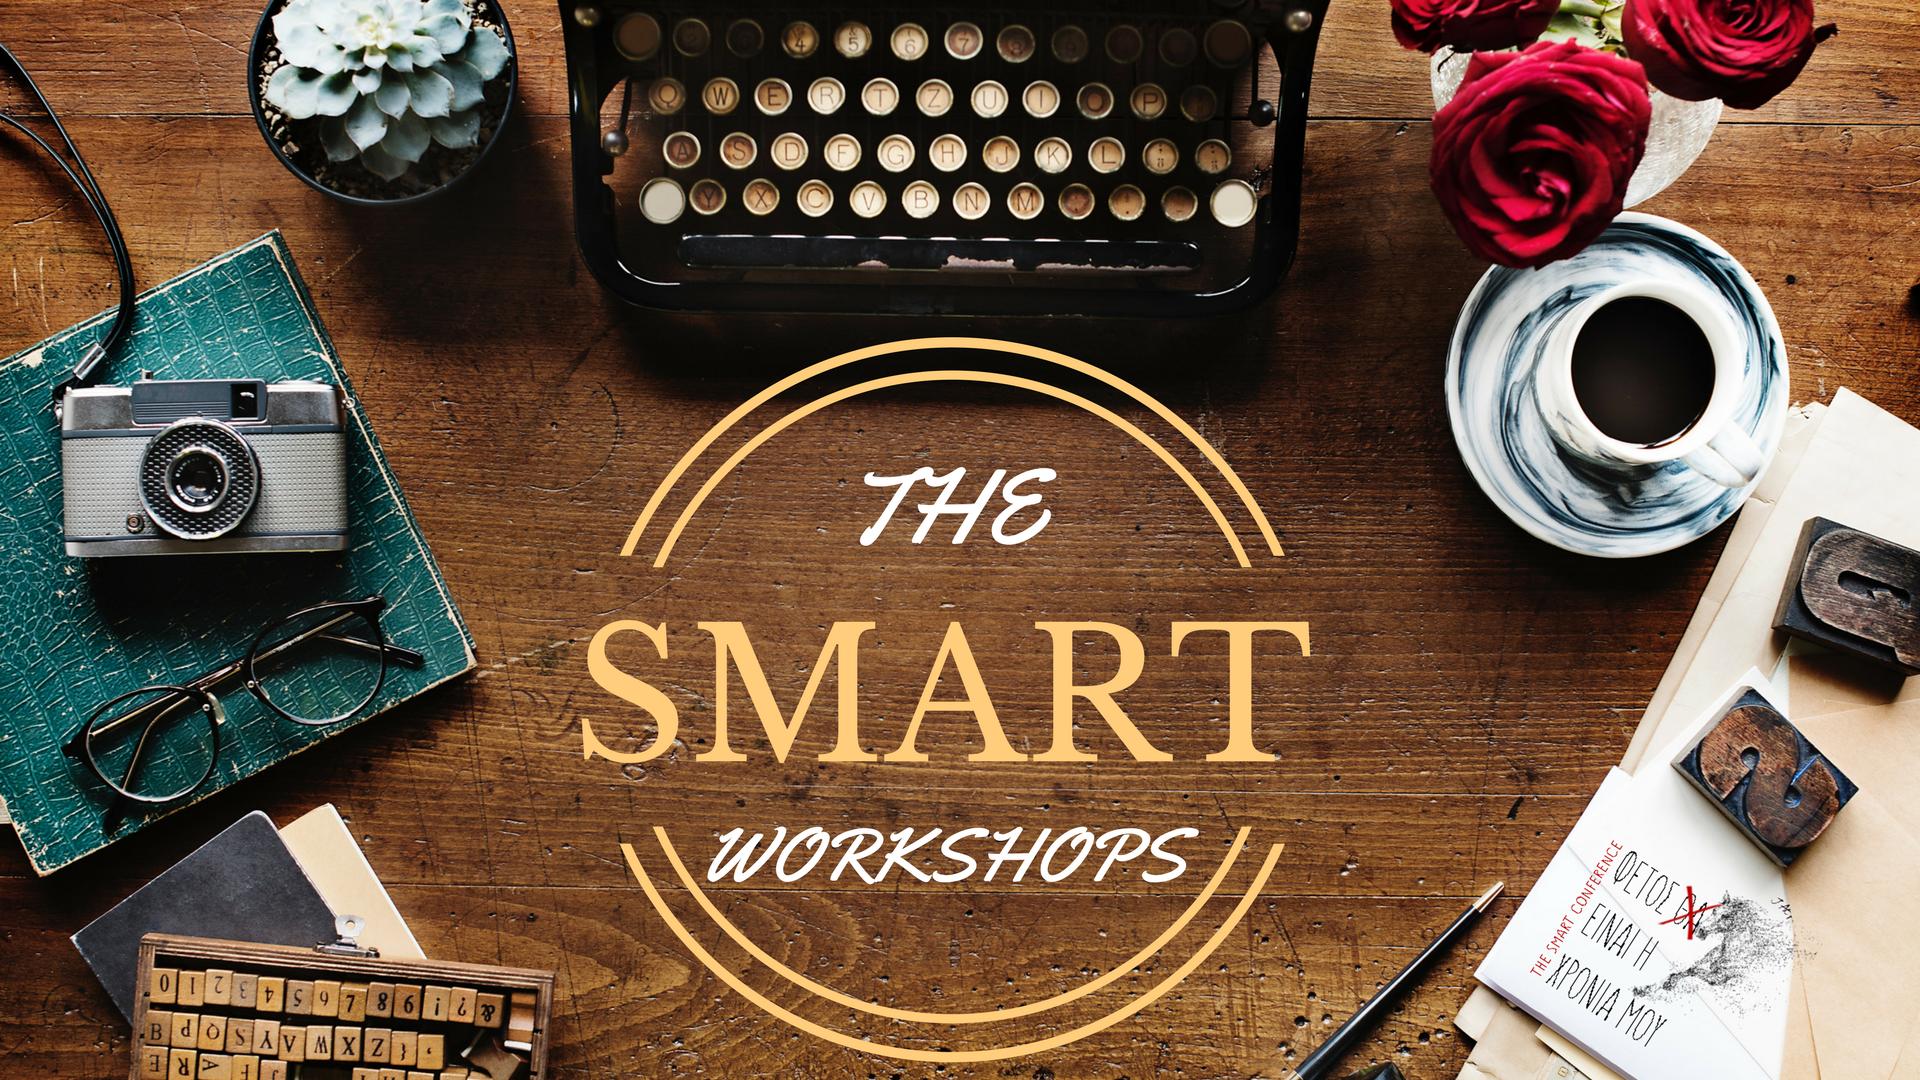 The SMART Workshops | Φέτος ΕΙΝΑΙ η Χρονιά μου| Αθήνα | Θεσσαλονίκη